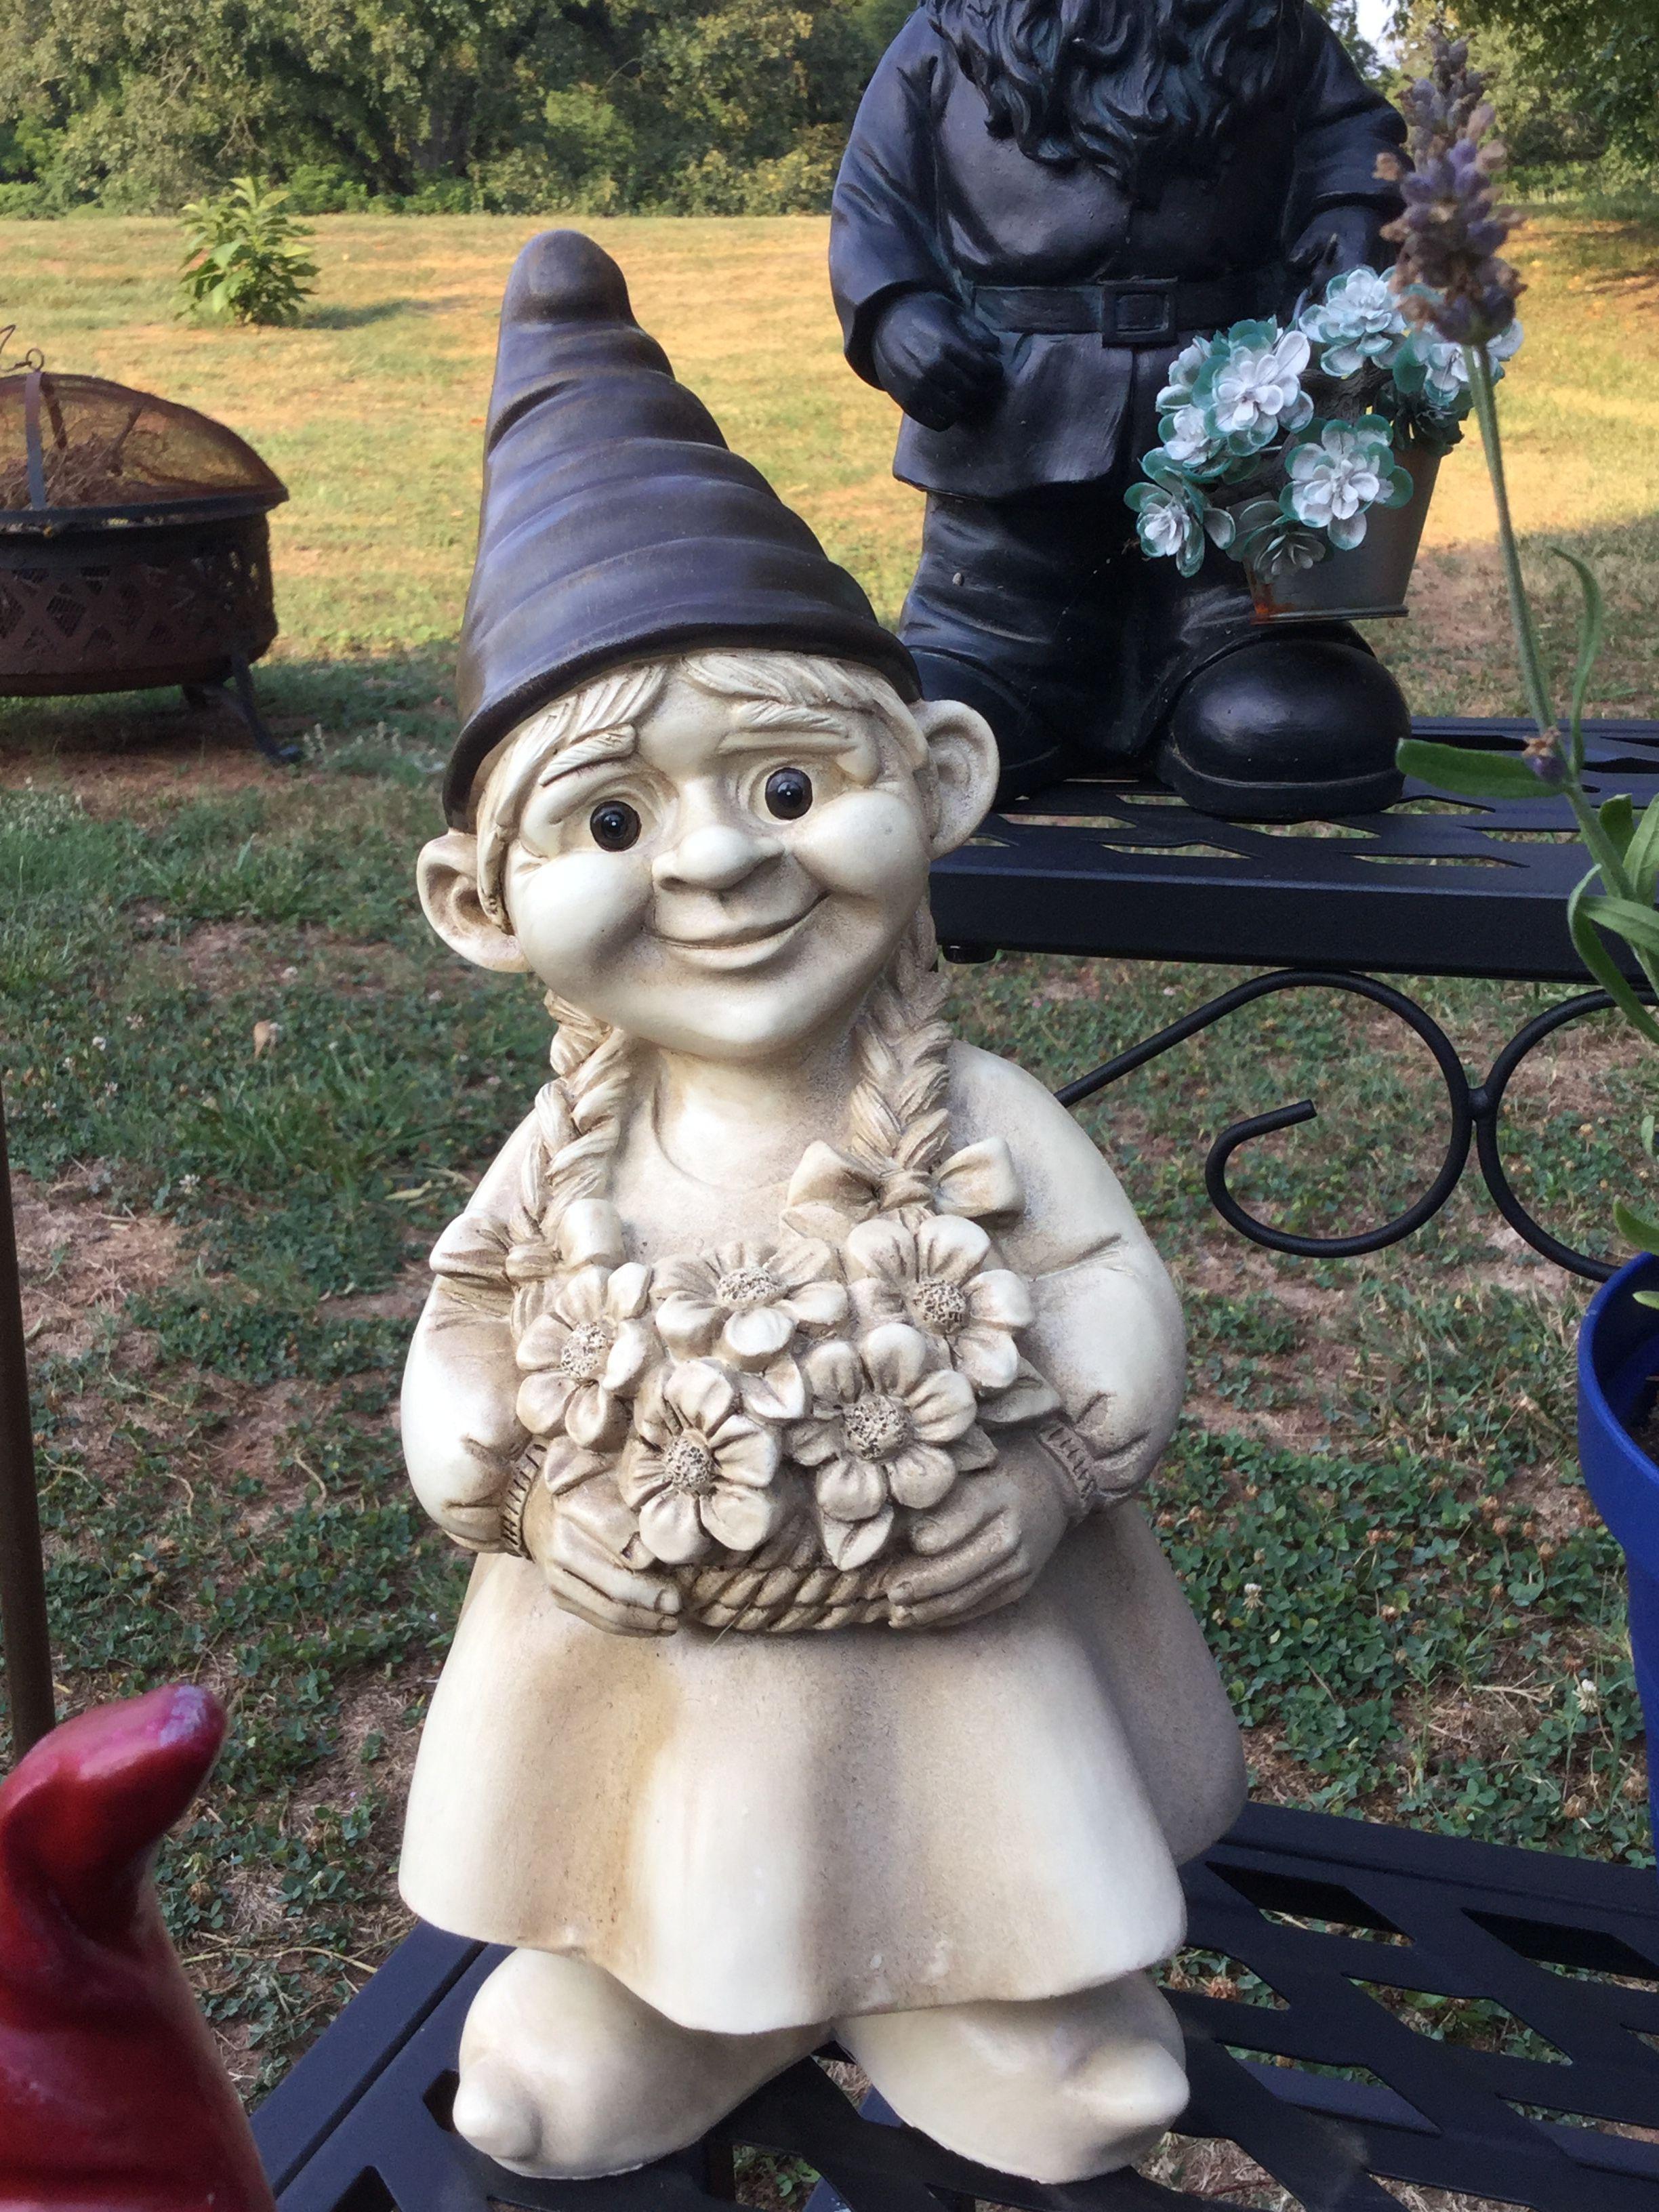 Found at Home Goods  Outdoor decor, Home goods, Garden sculpture